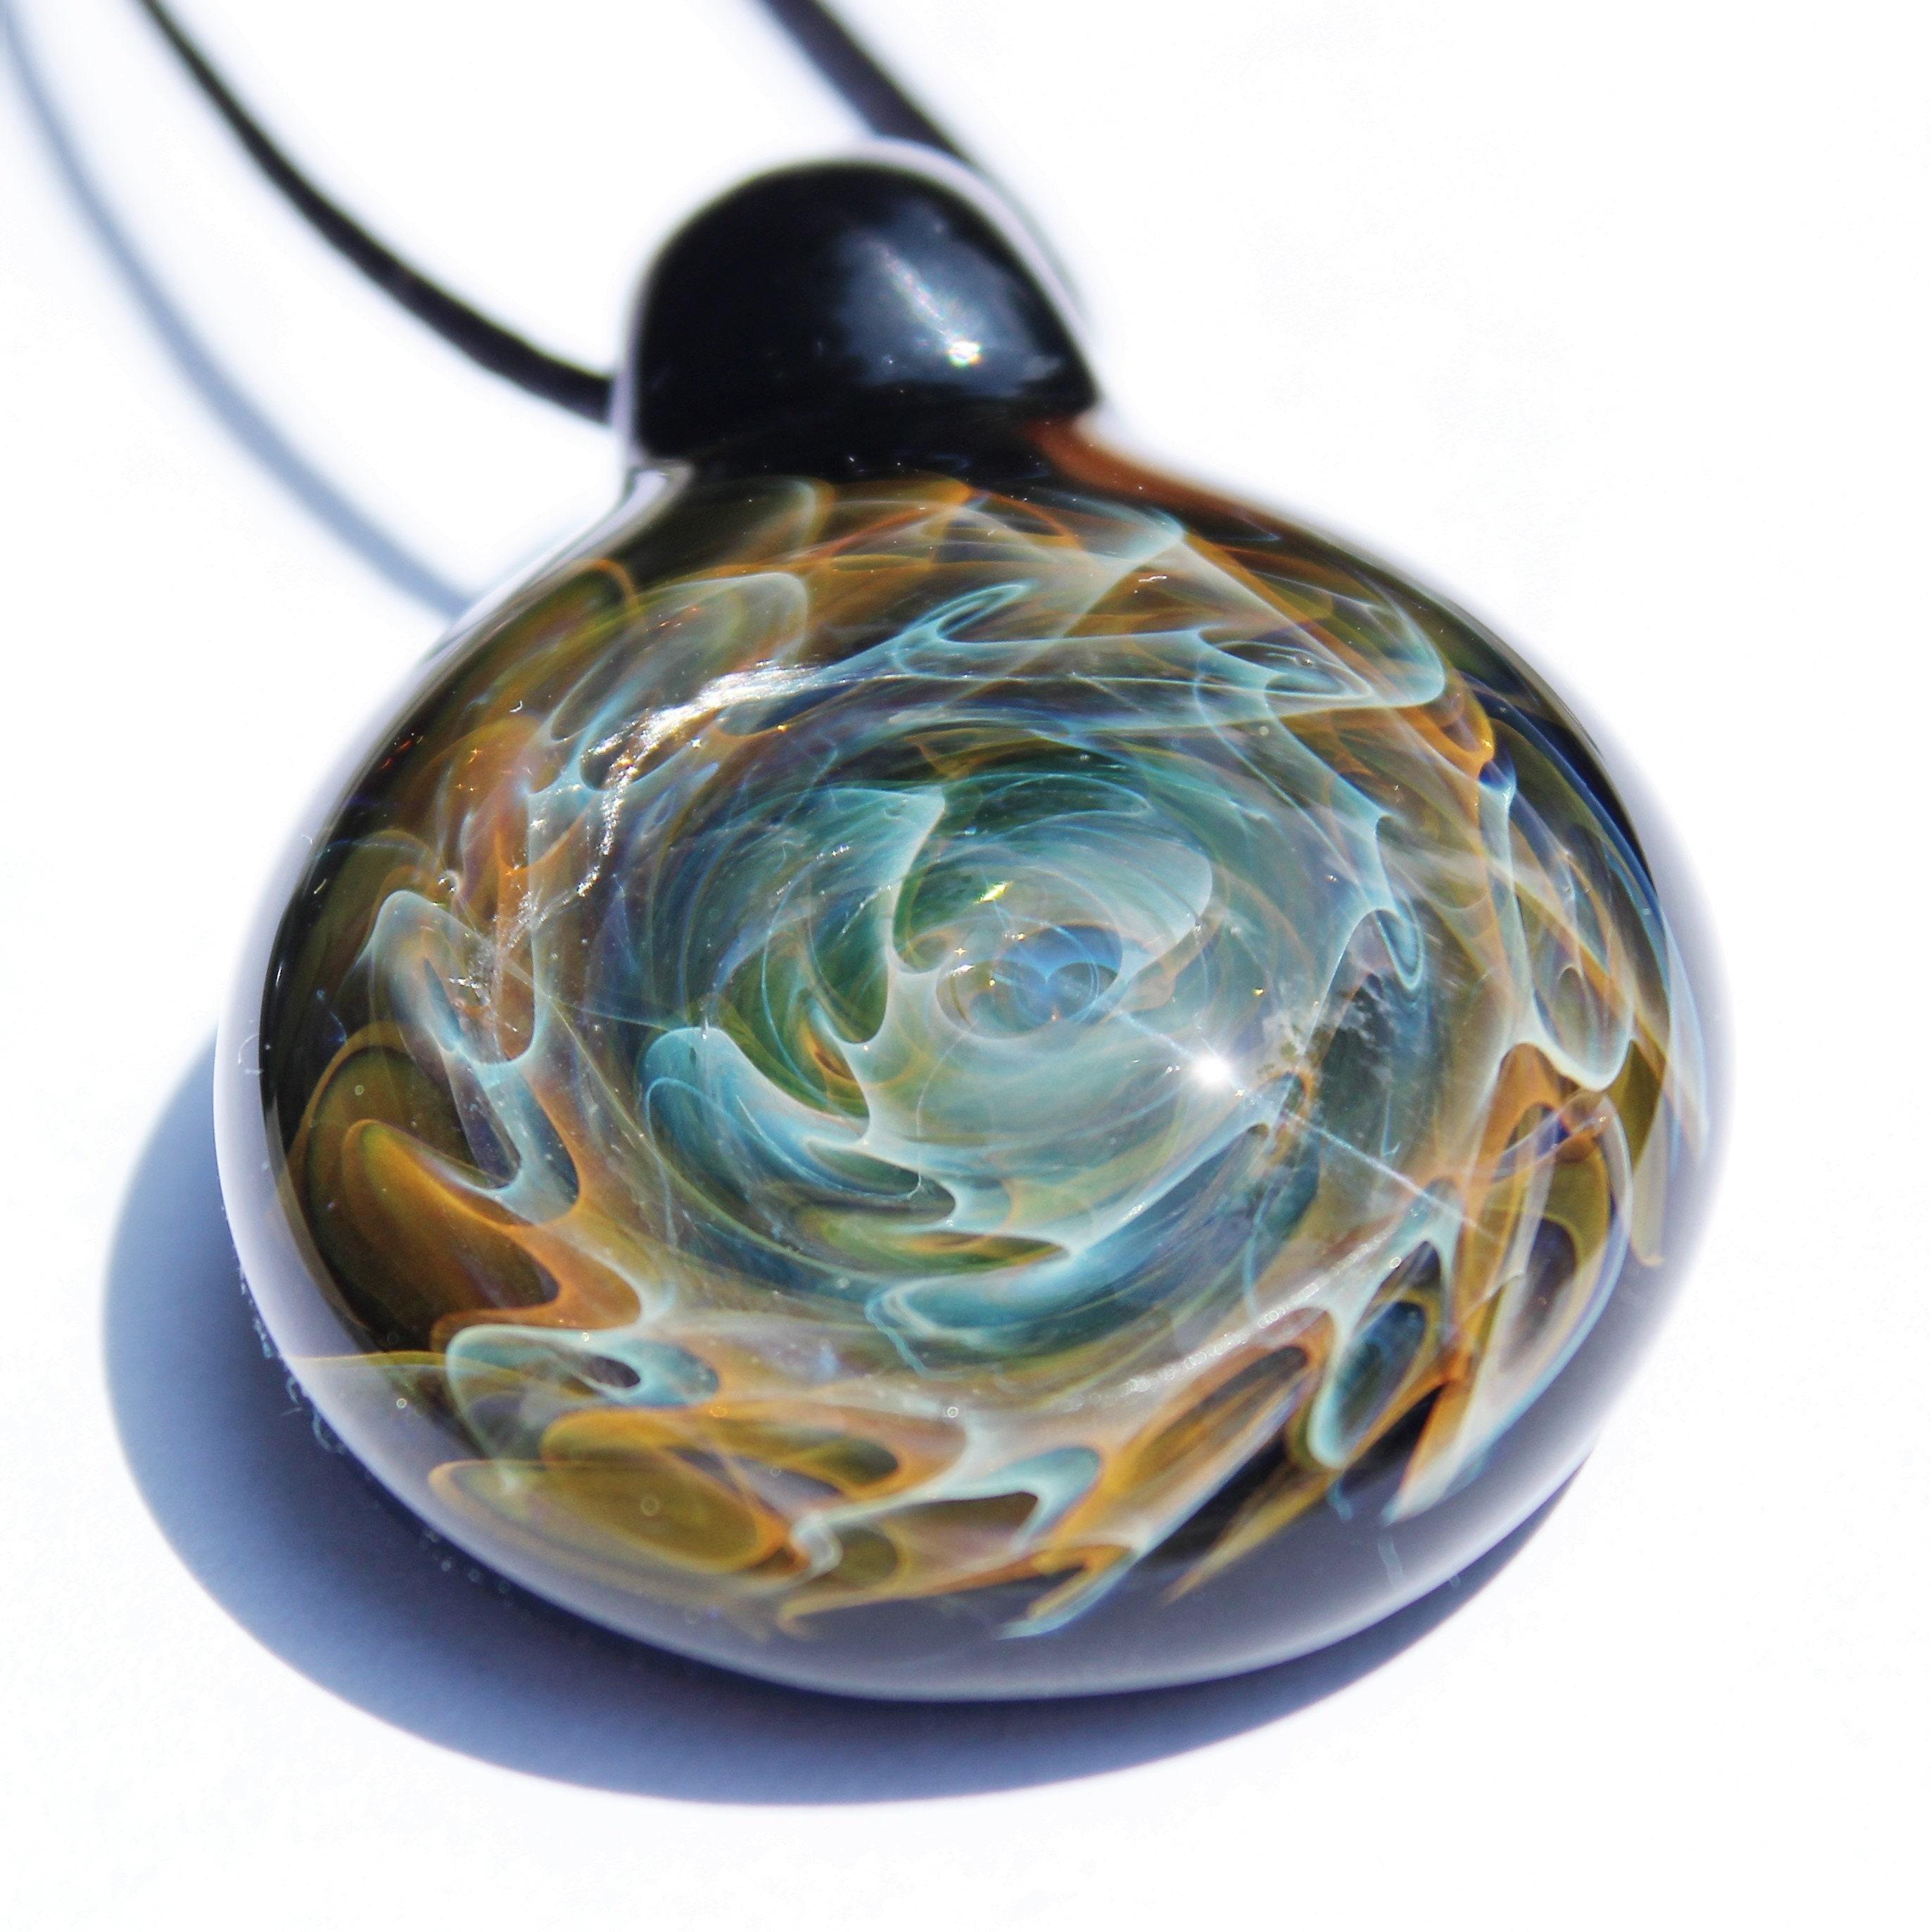 statement necklace galaxy blown glass pendant trippy glass pendant heady glass pendant galaxy necklace glass pendants birthday giftjewelry - Heady Glass Pendants